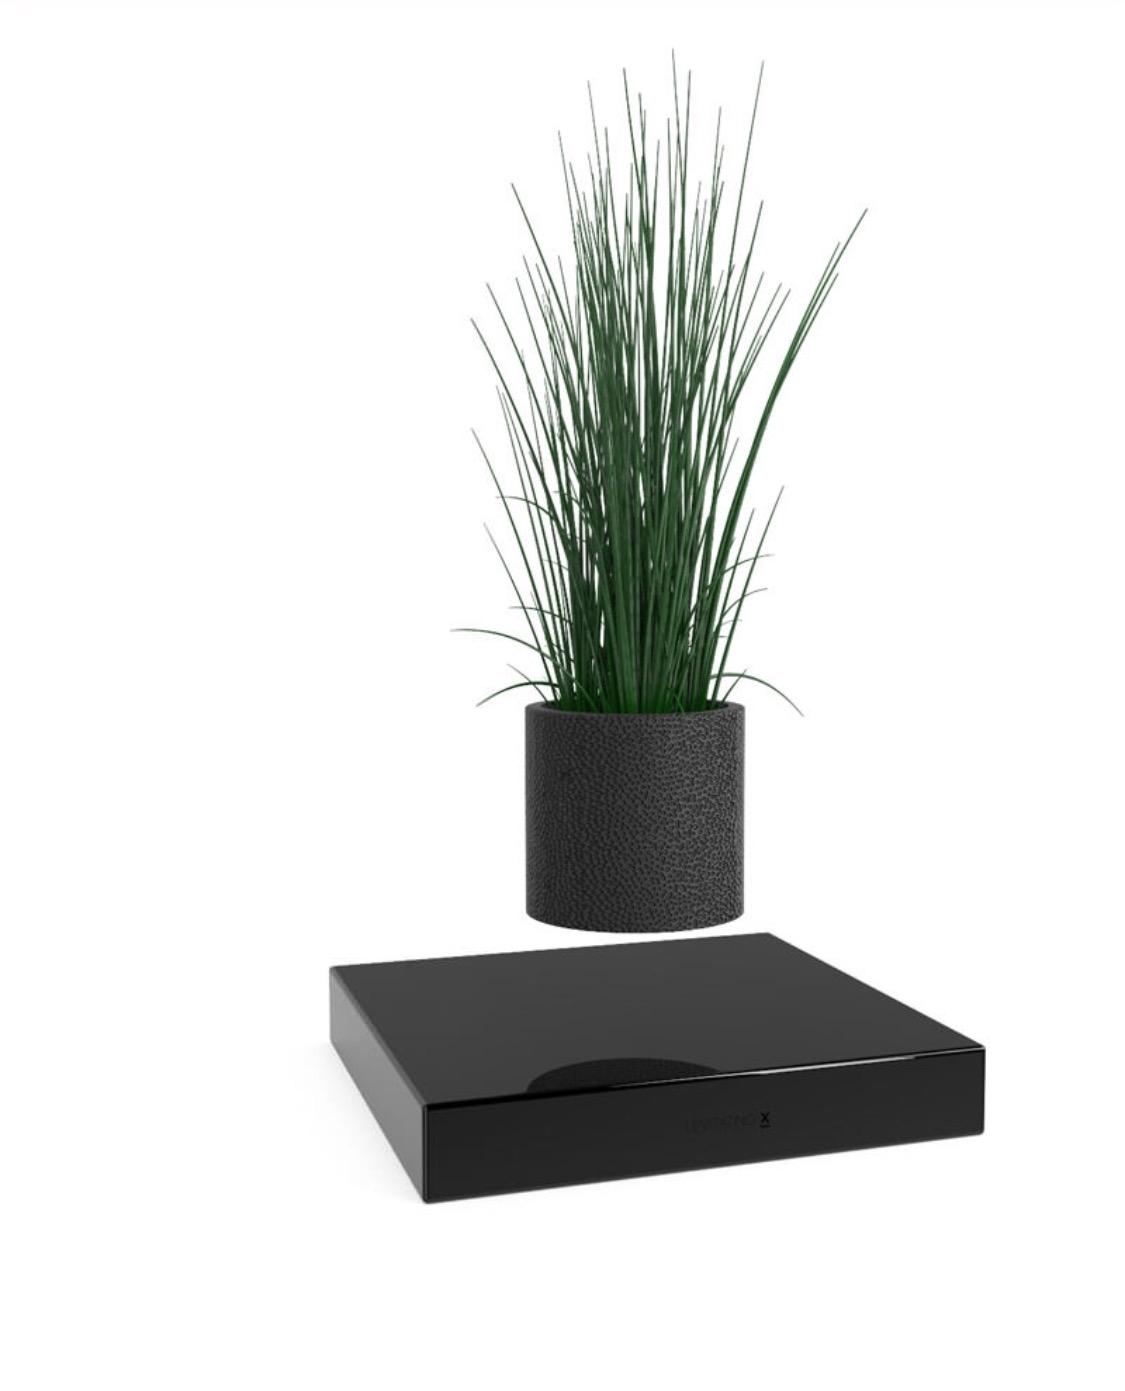 Levitating plant slaylebrity for Levitating plant